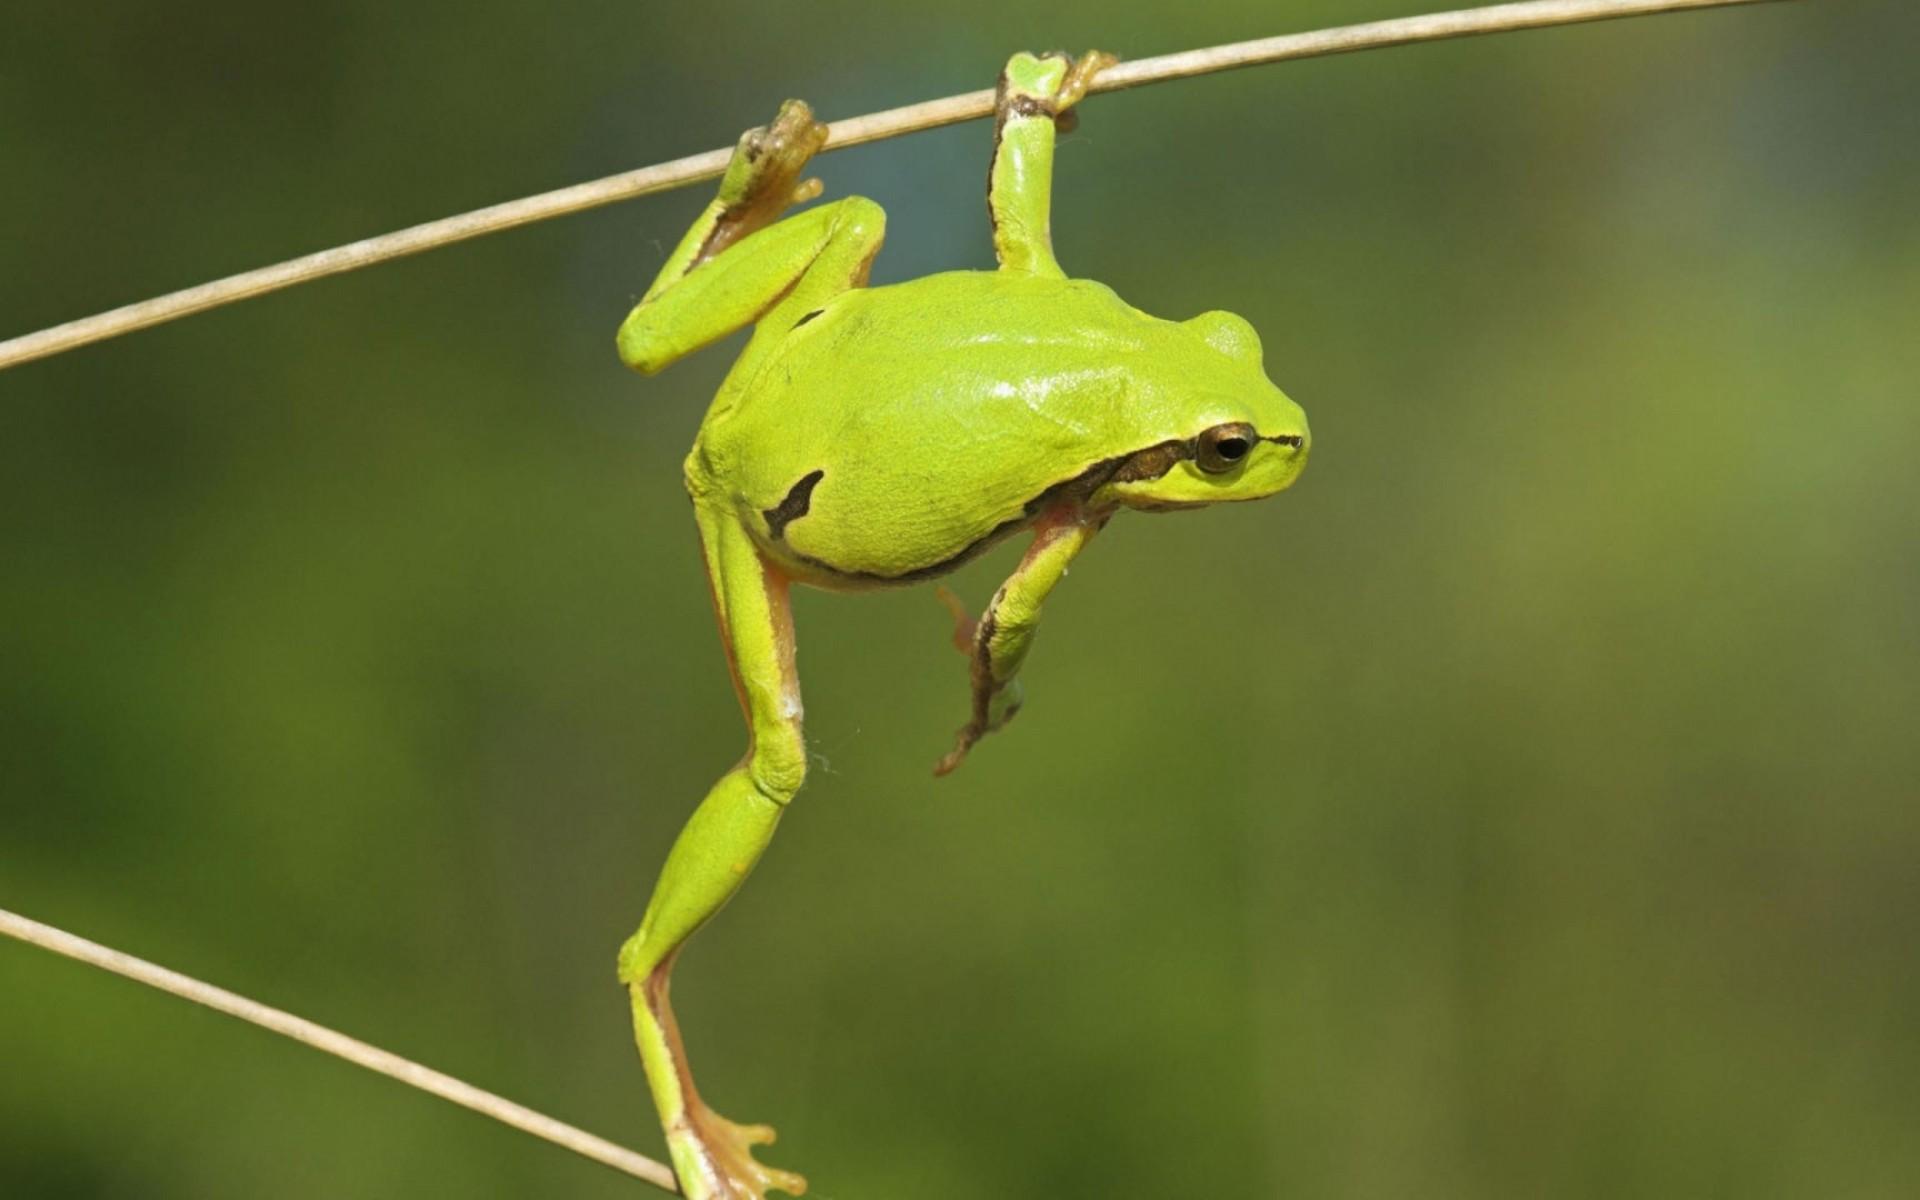 Frog Long Leg Wallpaper HD 1920x1200 1286 1920x1200